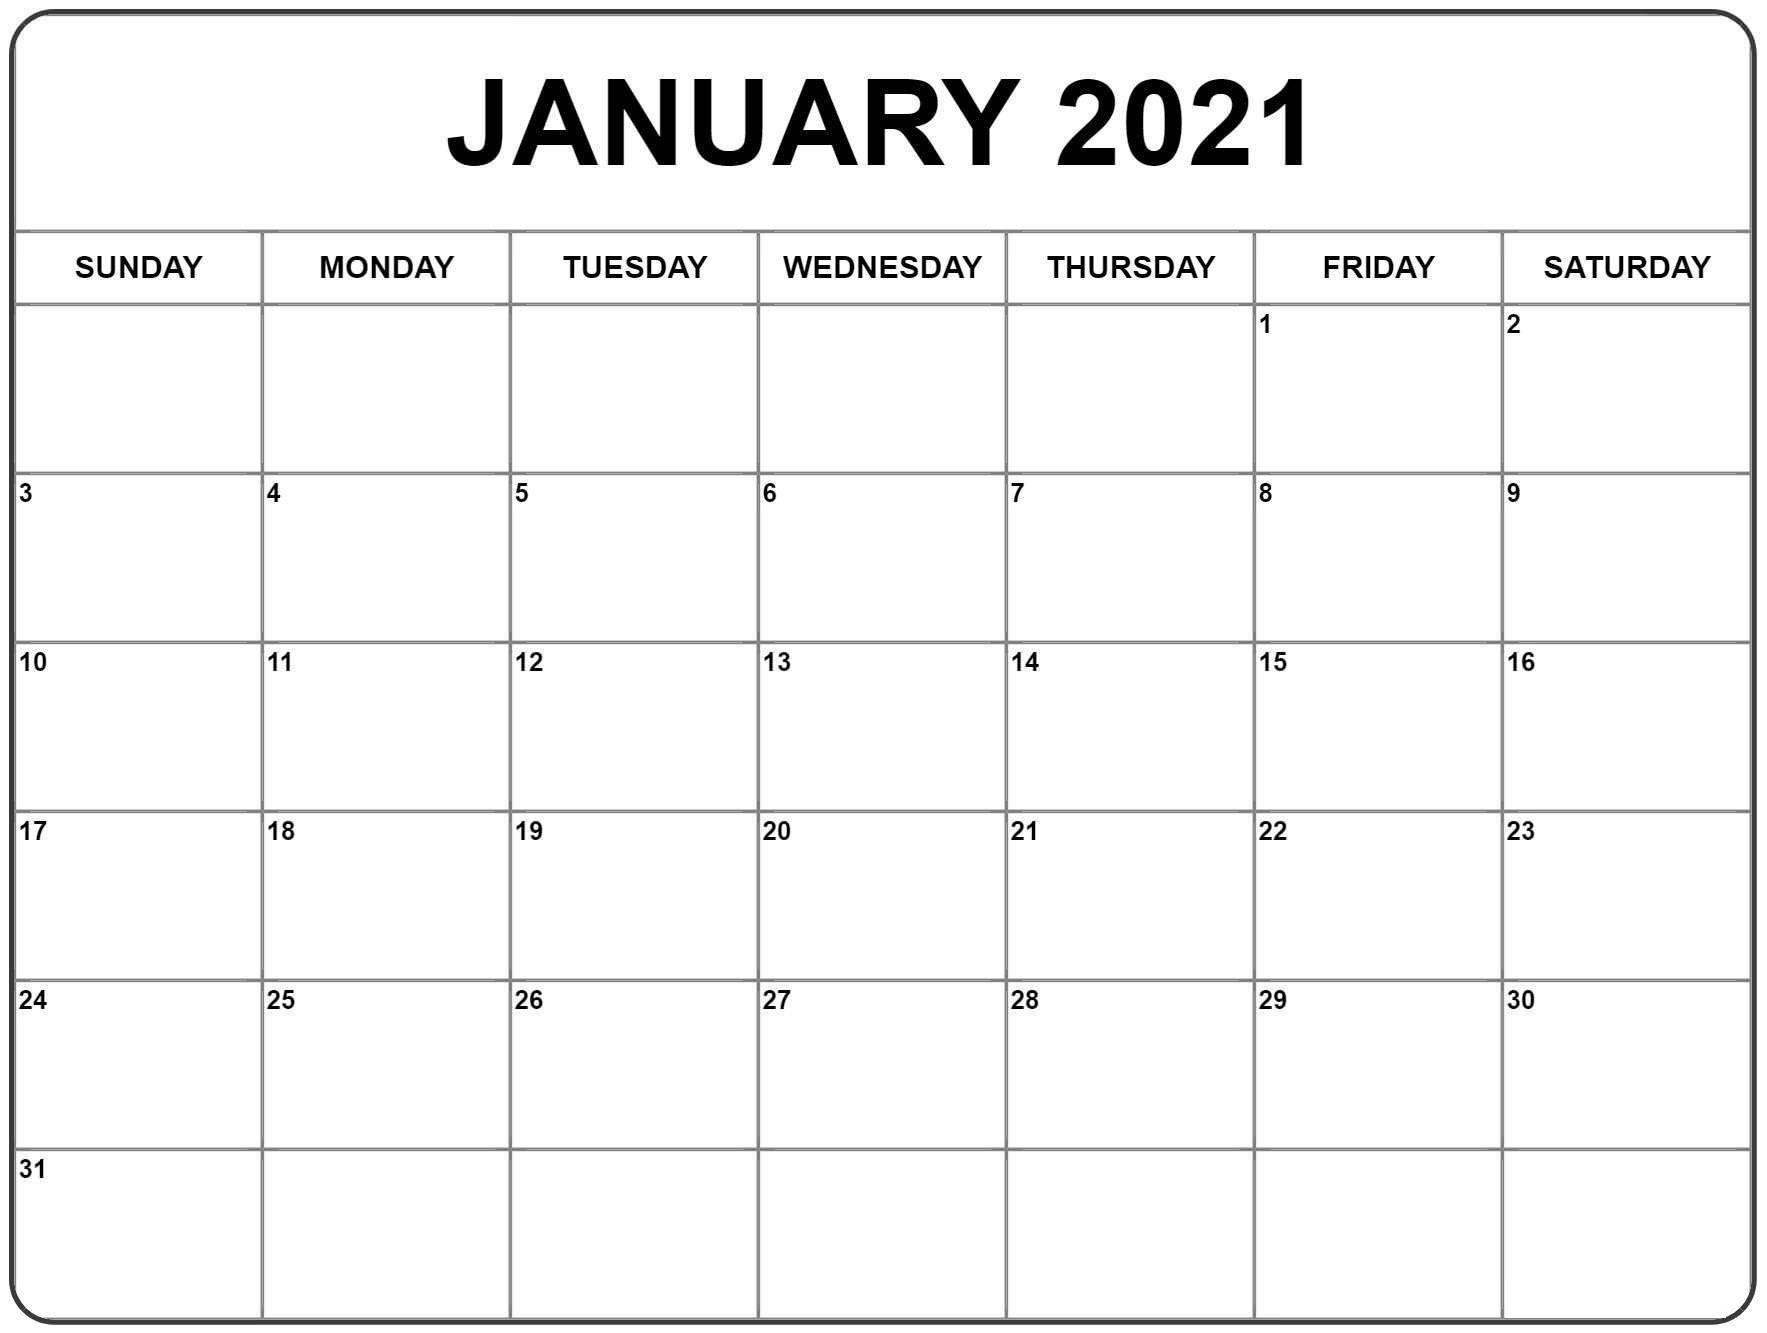 Free January 2021 Calendar Printable Blank Templates 4